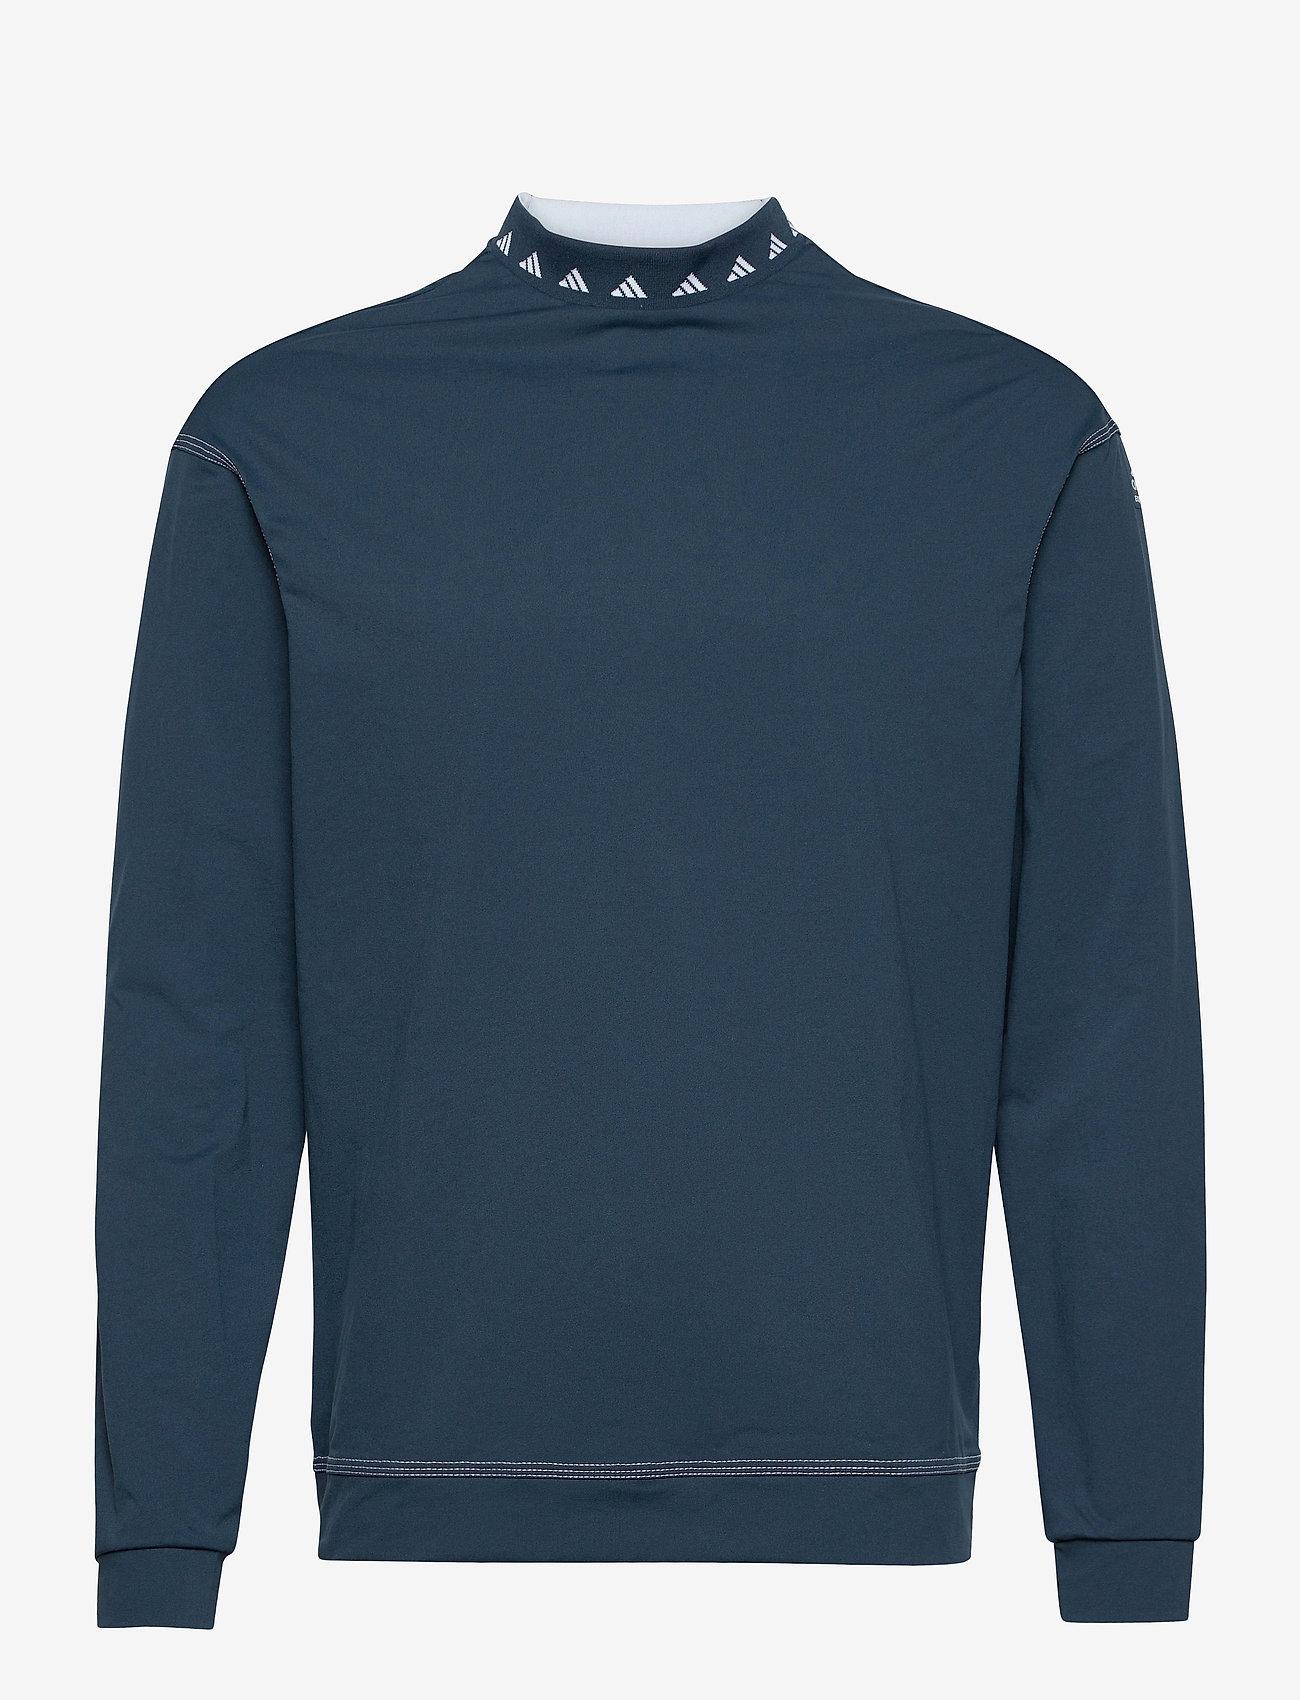 adidas Golf - EQPMNT WIND CRW - golf jackets - crenav - 0